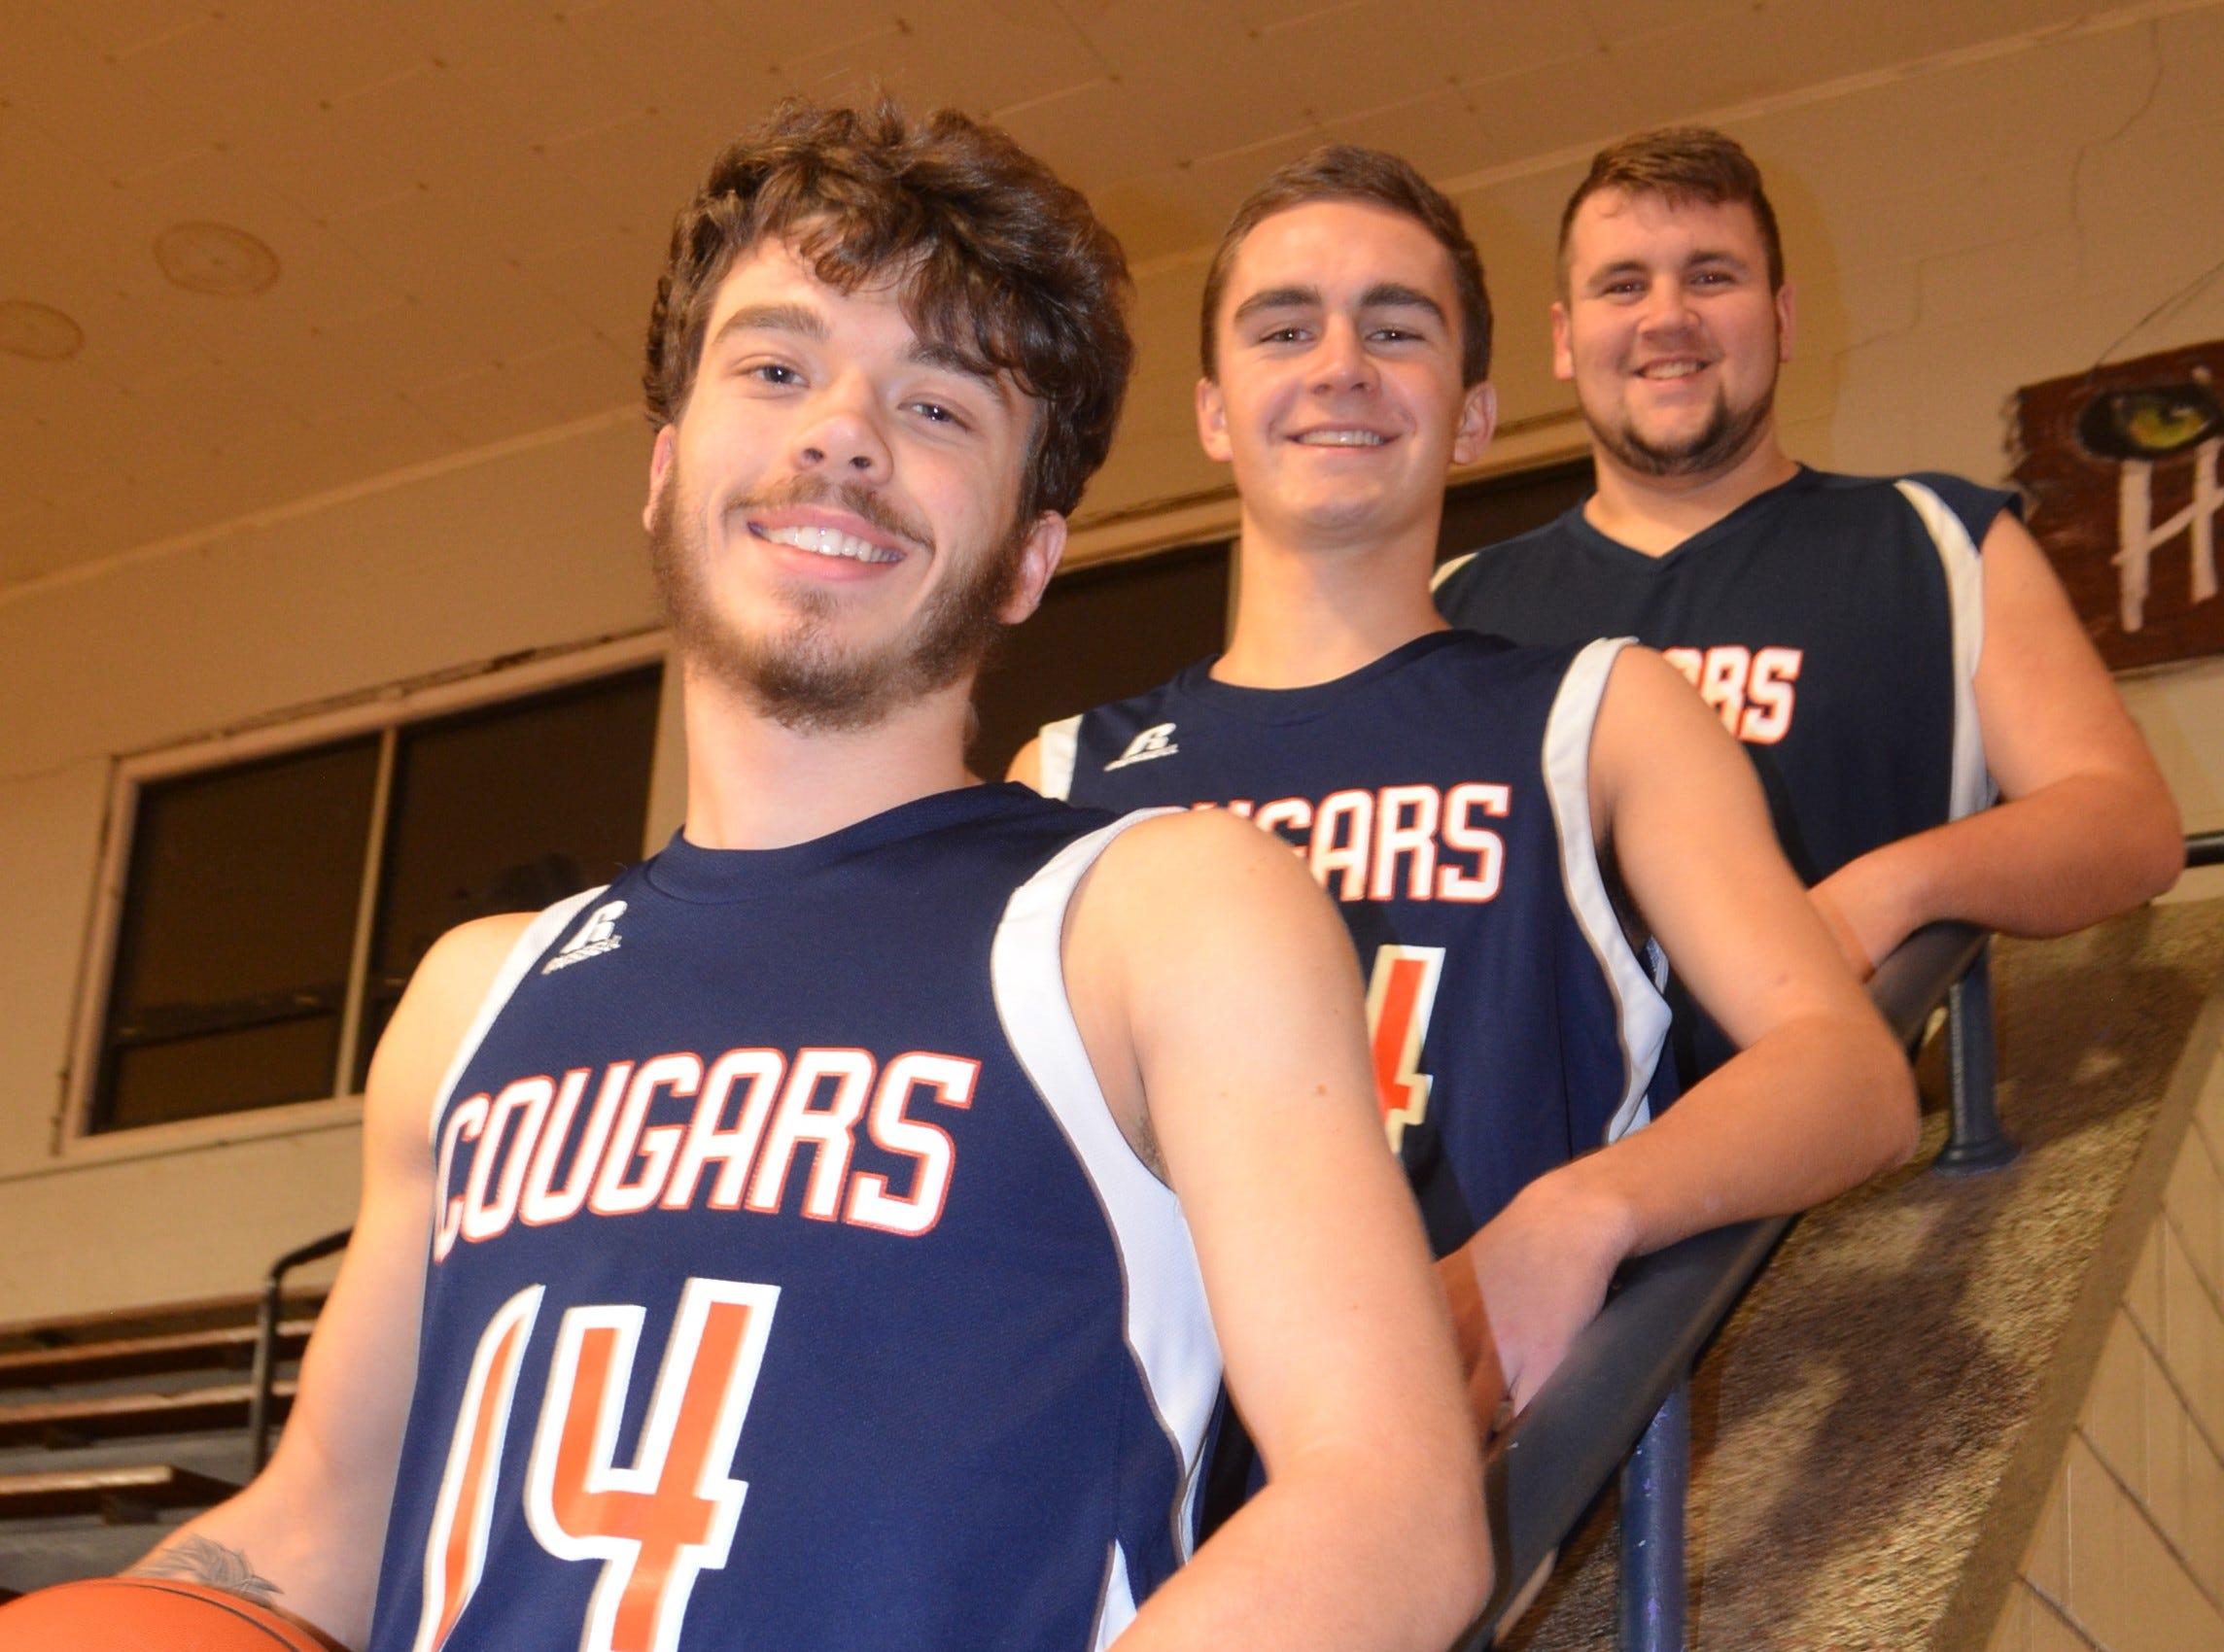 The returning leaders for the 2018-19 Calhoun Christian boys basketball team include, from left, Ethan Reed, Alex Wilcox and Samuel Bennett